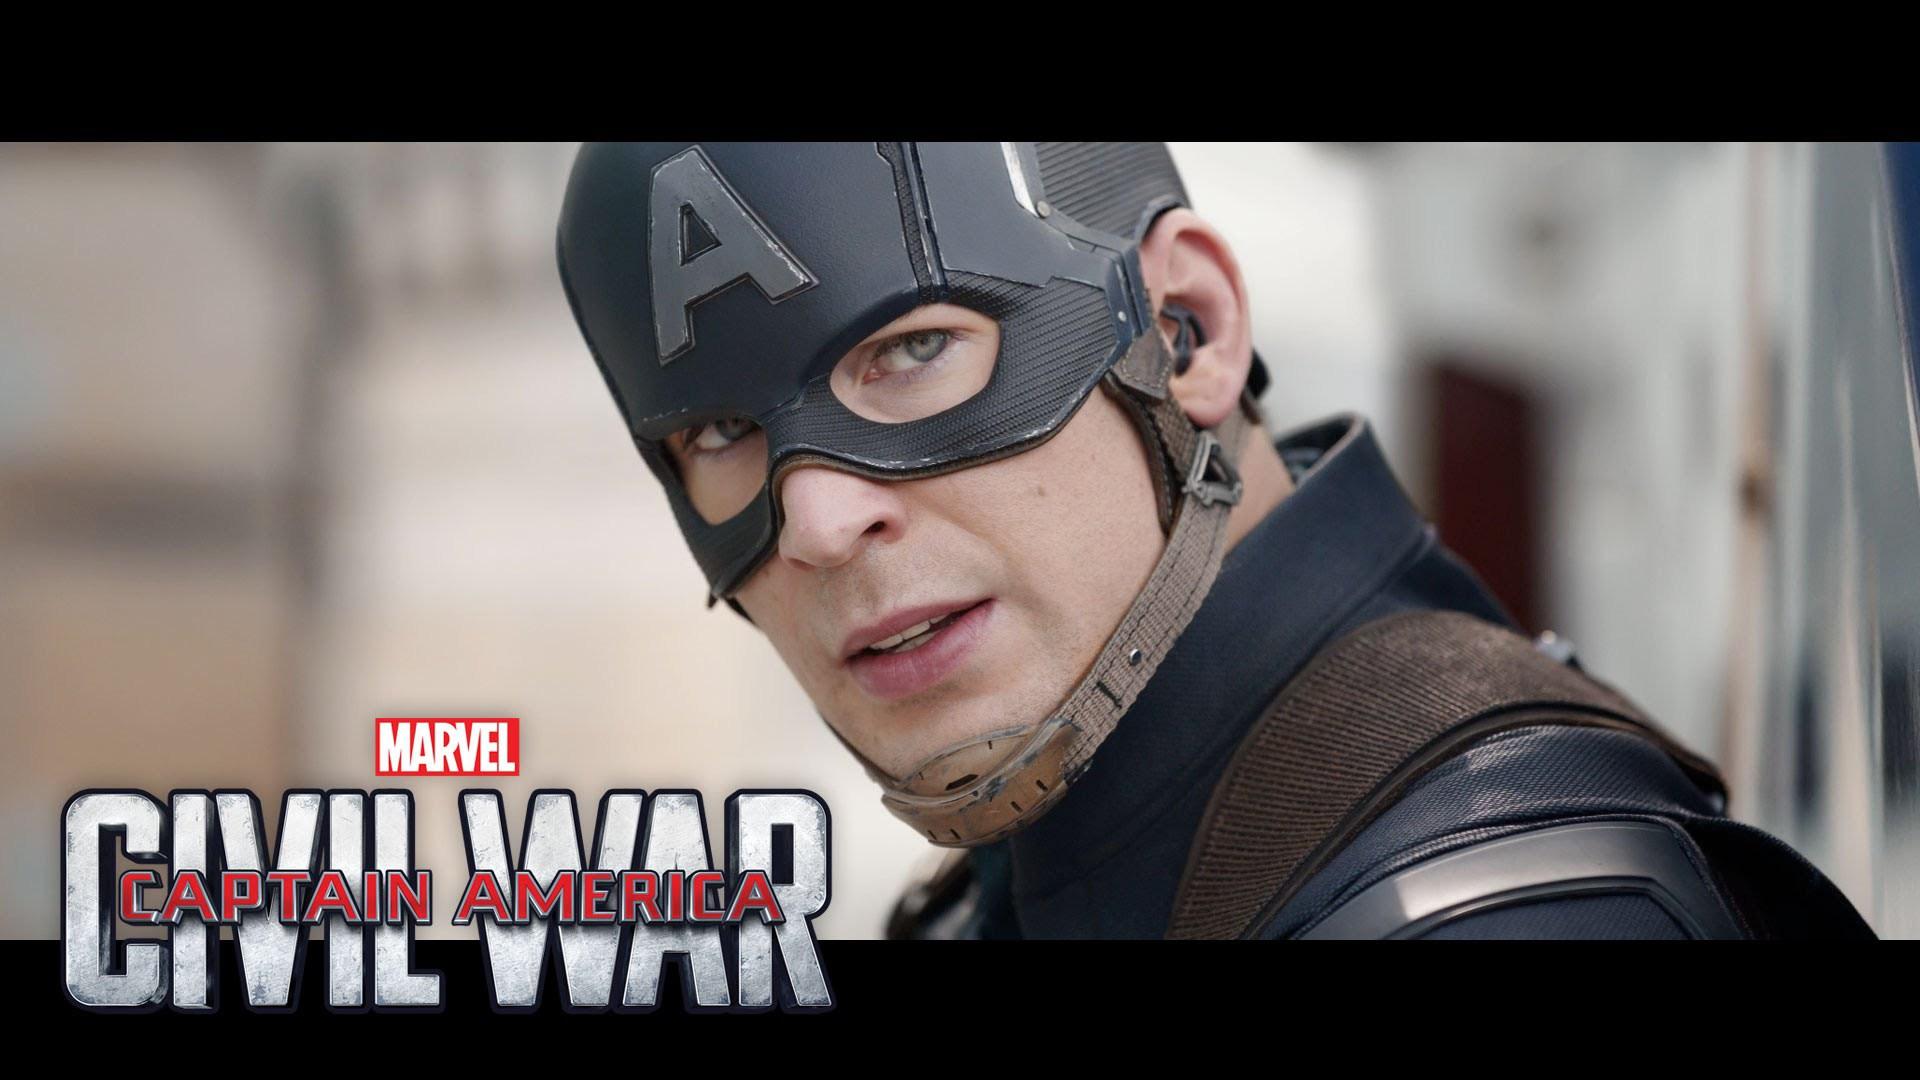 Captain America Civil War 4k: Captain America Civil War 4K